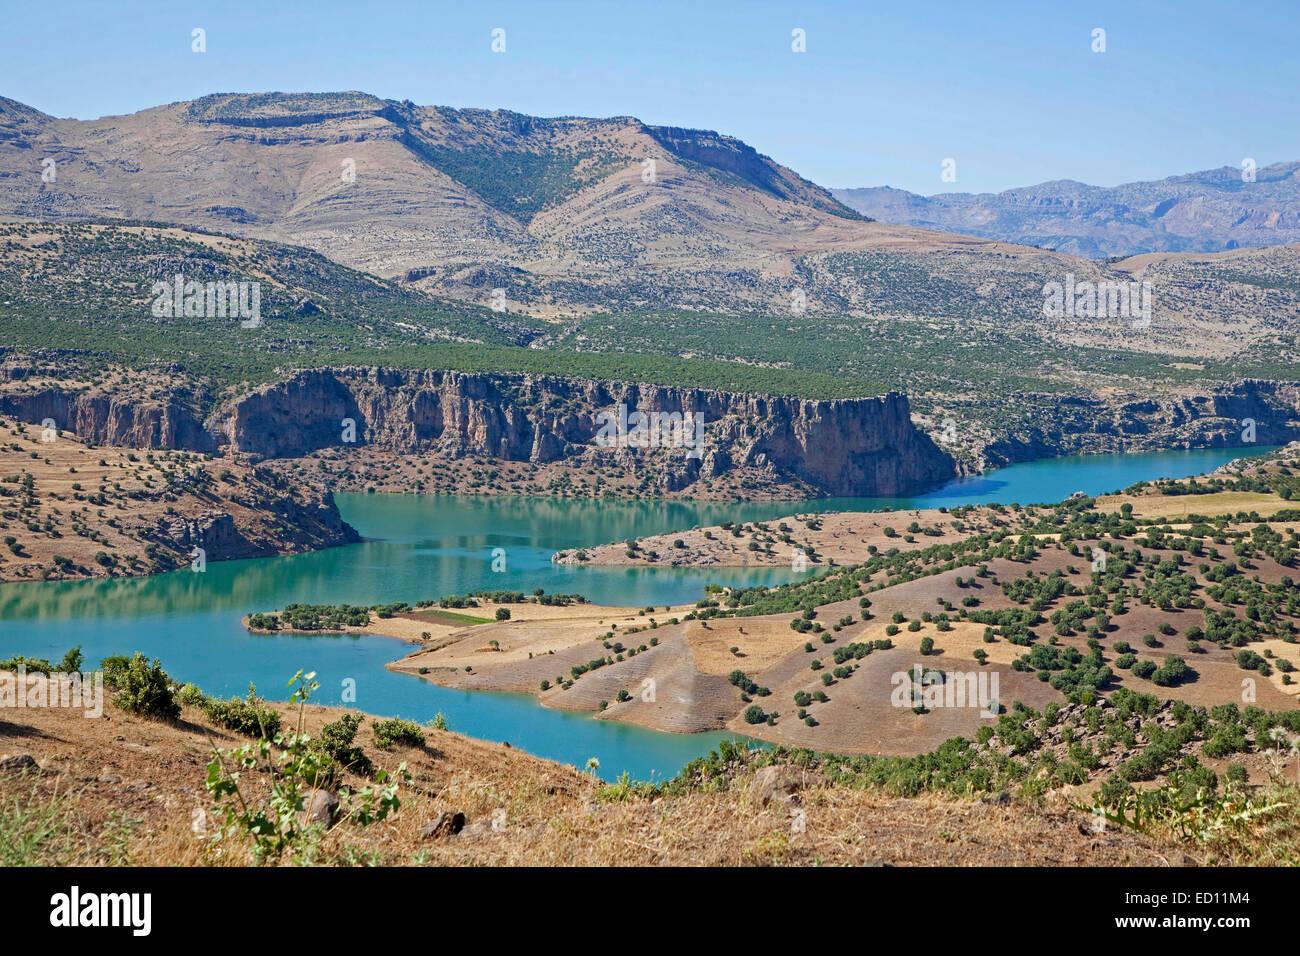 Euphrates, longest river of Western Asia in Eastern Turkey - Stock Image